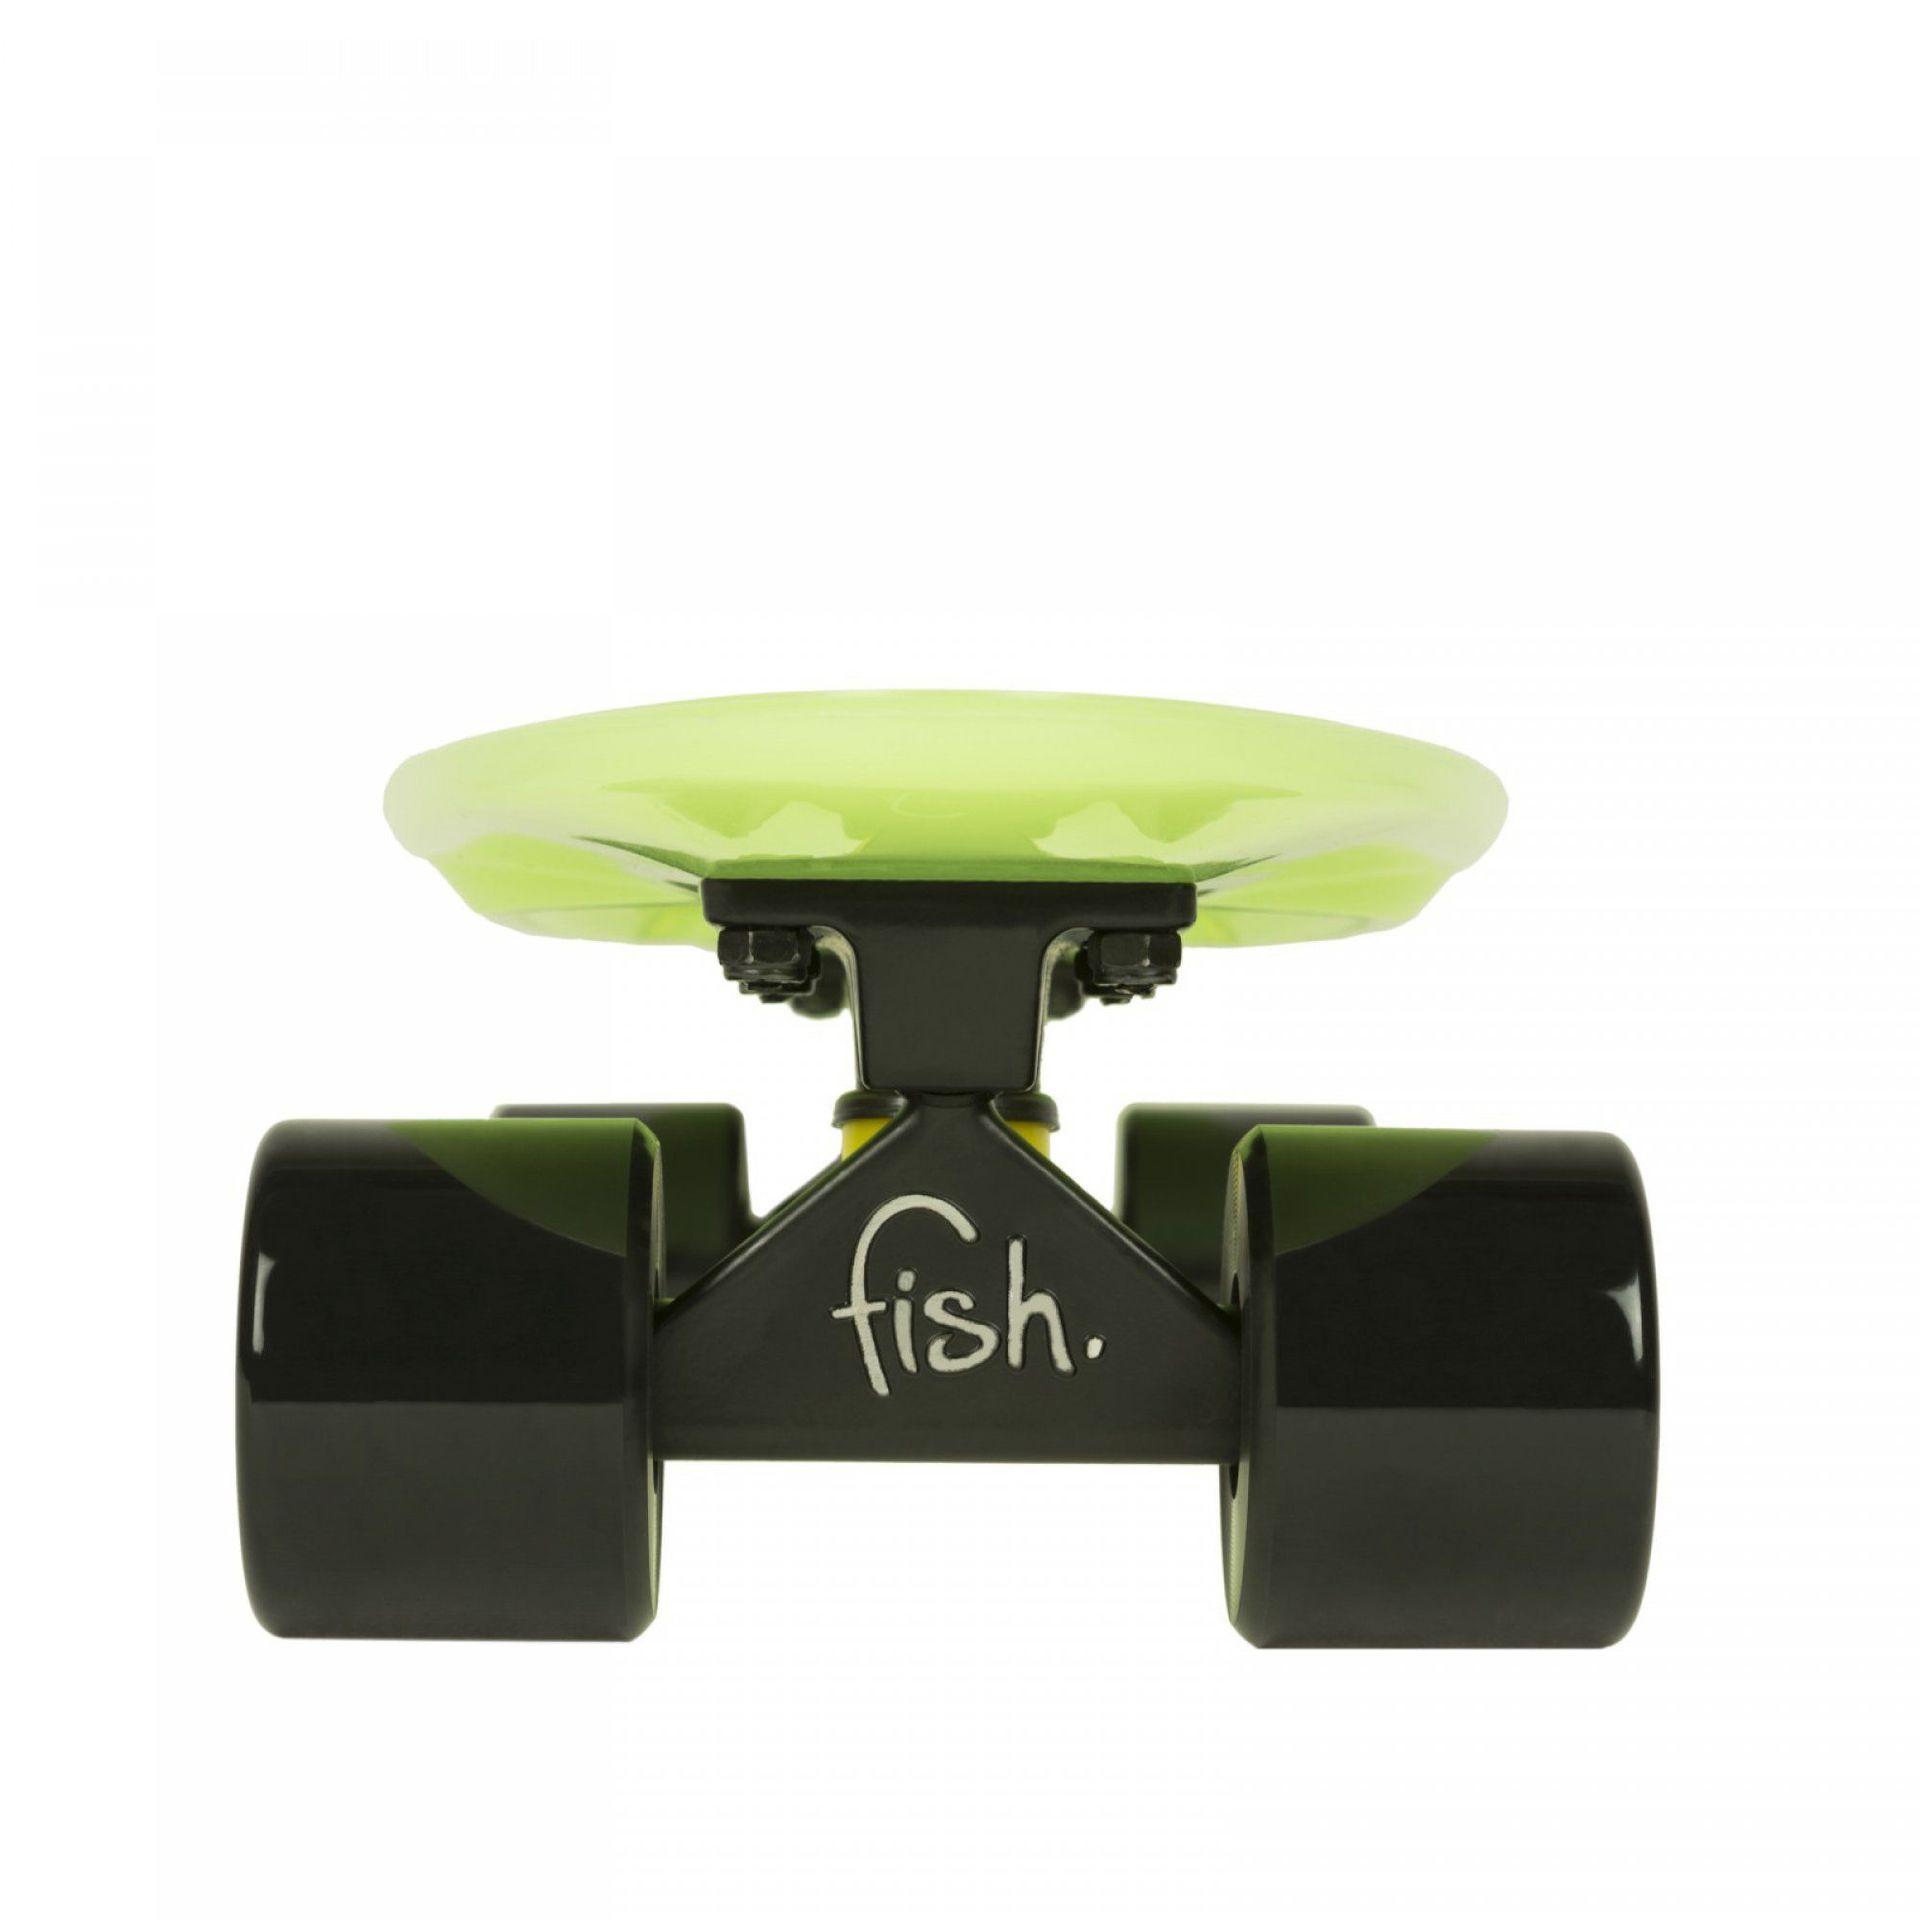 FISHBOARD FISH SKATEBOARDS CLASSIC GLOW GREEN|BLACK 2